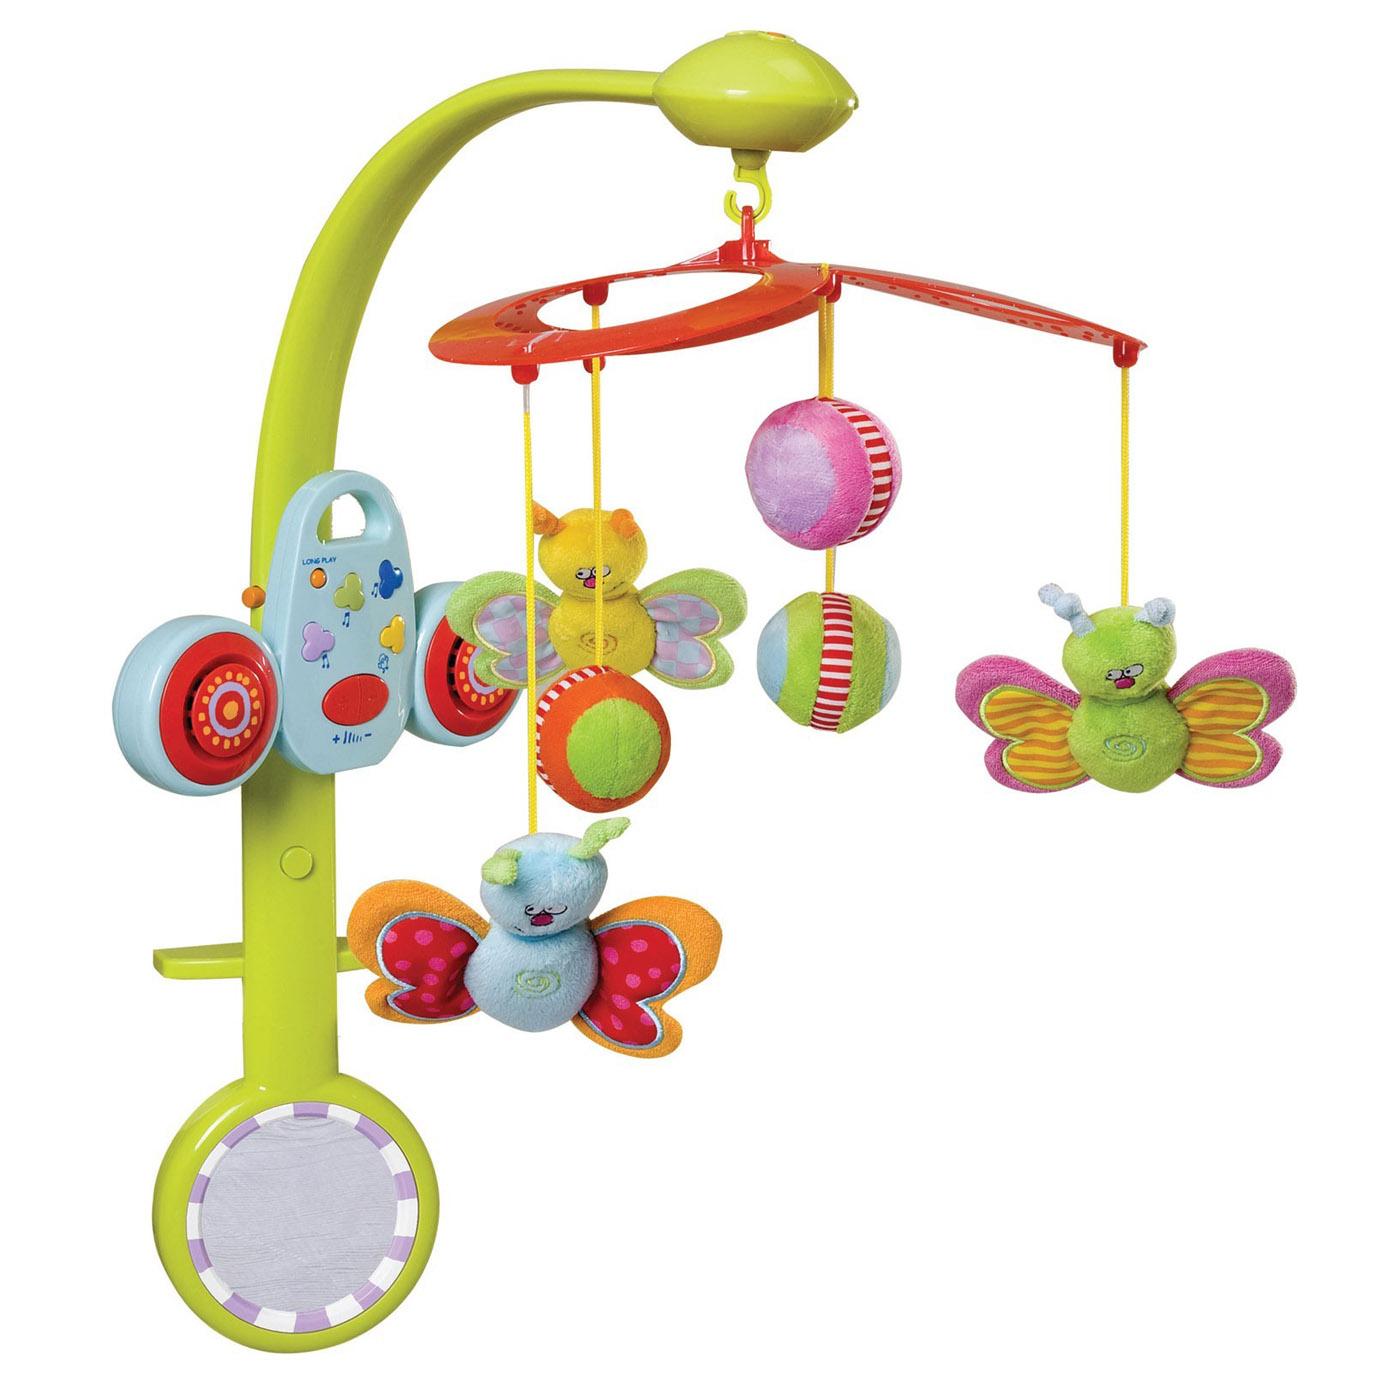 ������ Taf Toys ������� � 0 ���.